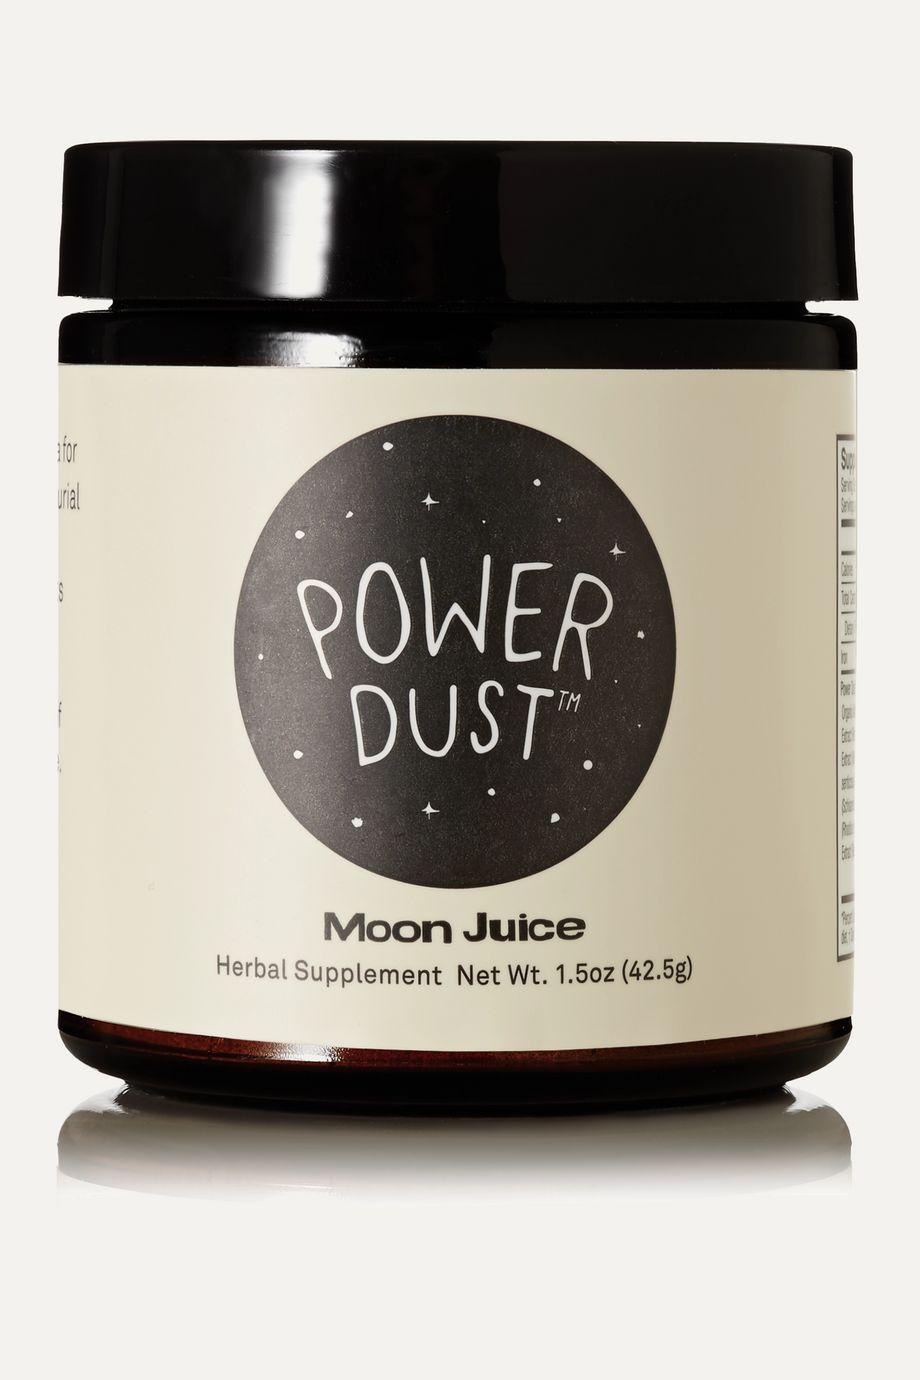 Moon Juice Power Dust, 42.5g